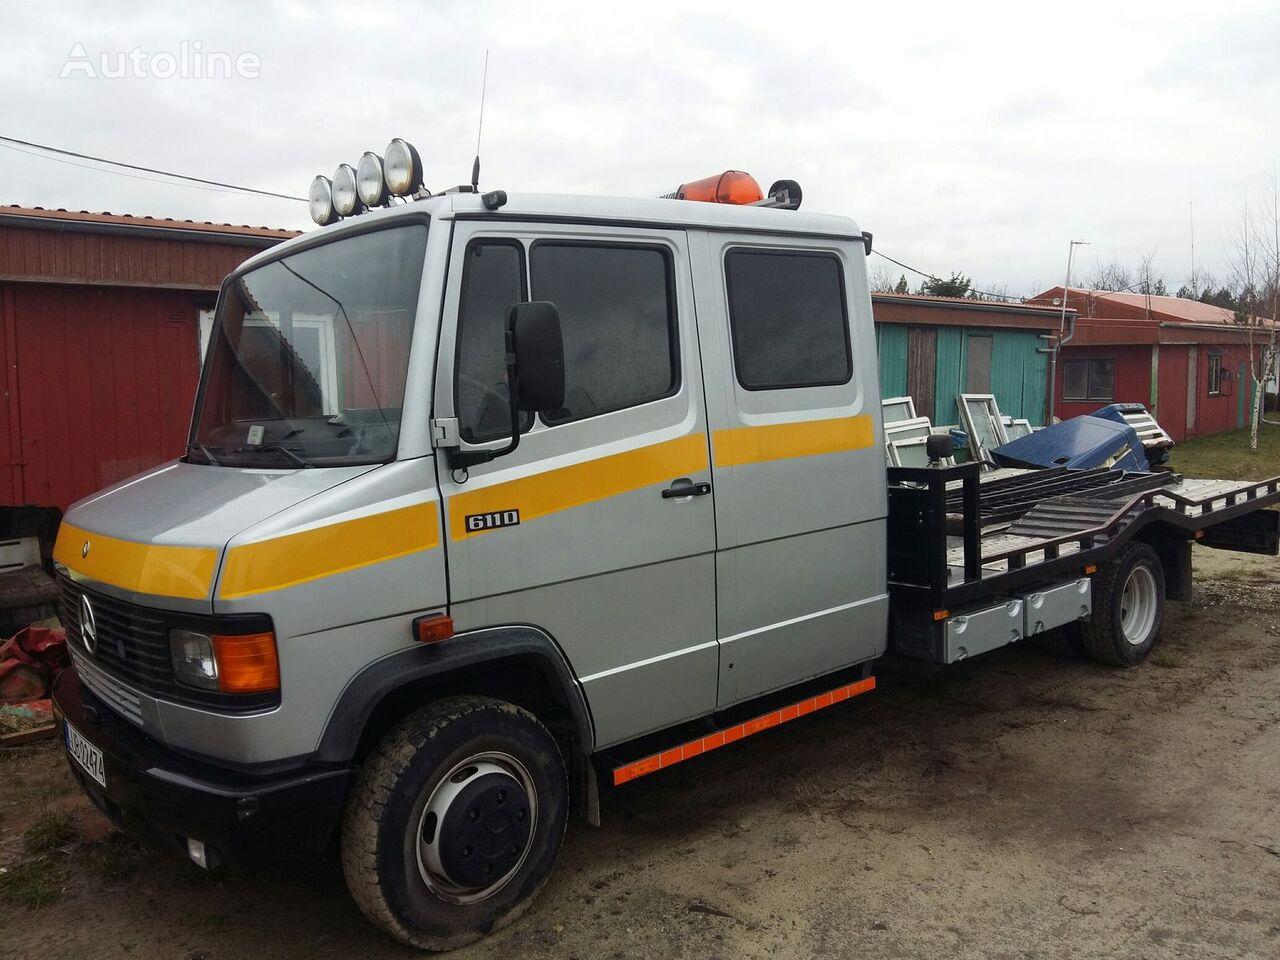 MERCEDES-BENZ 611 D car transporter